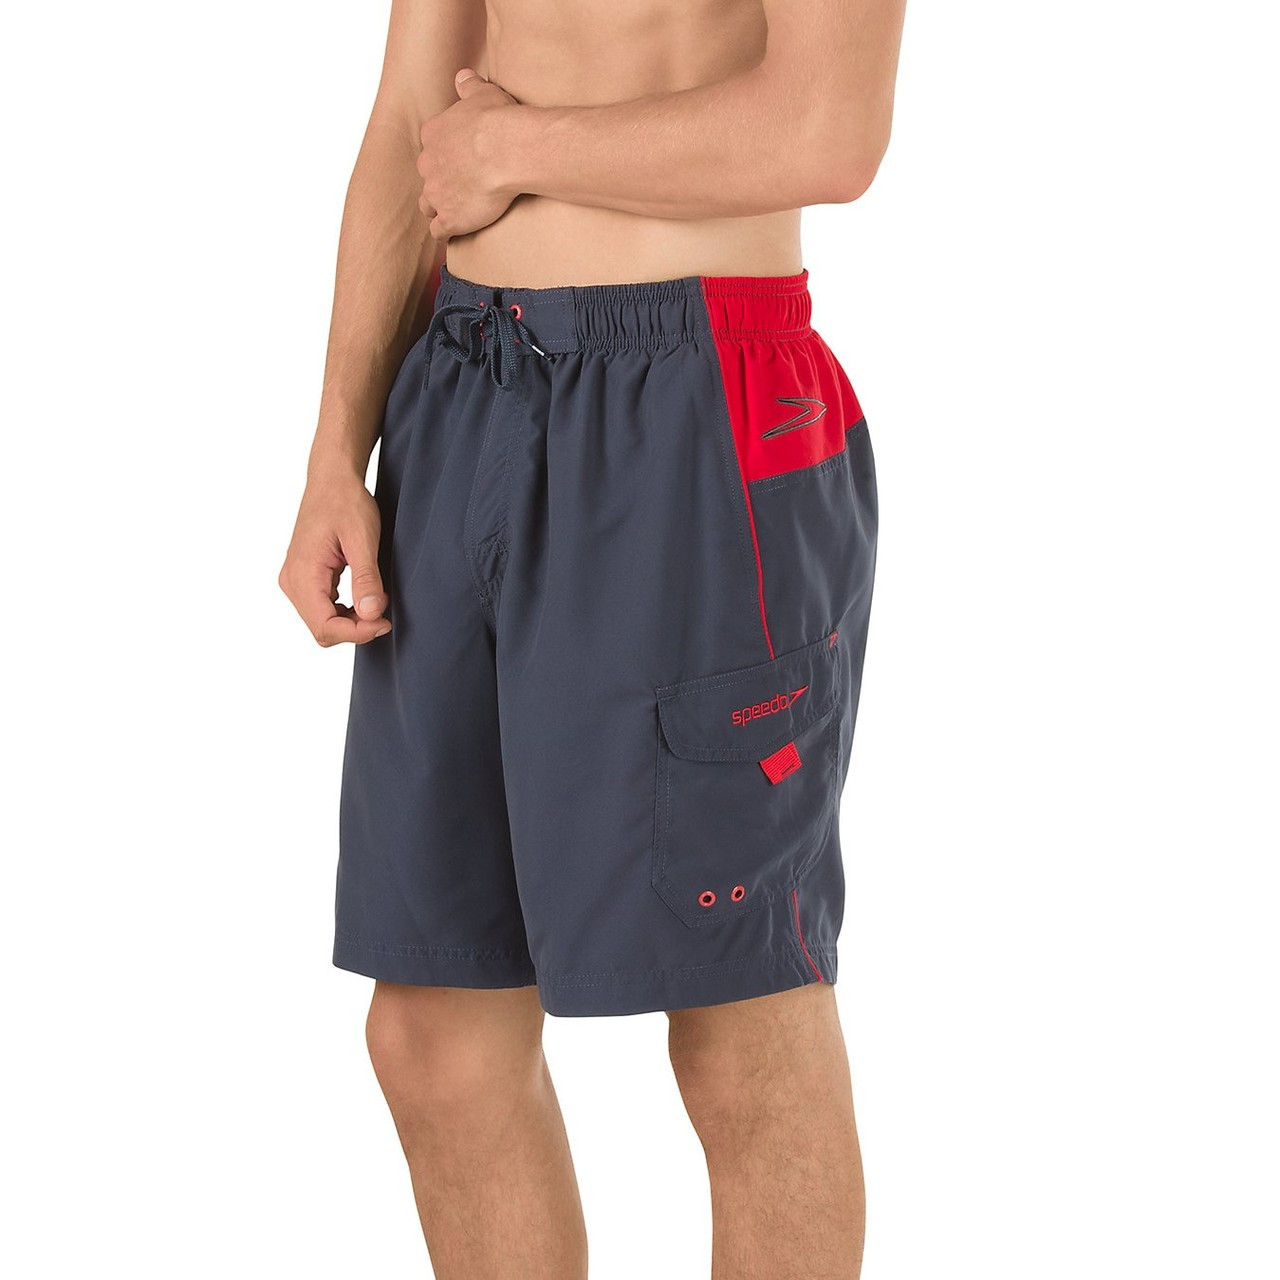 0721318ab9 Speedo Men's Sport Volley Swim Trunk